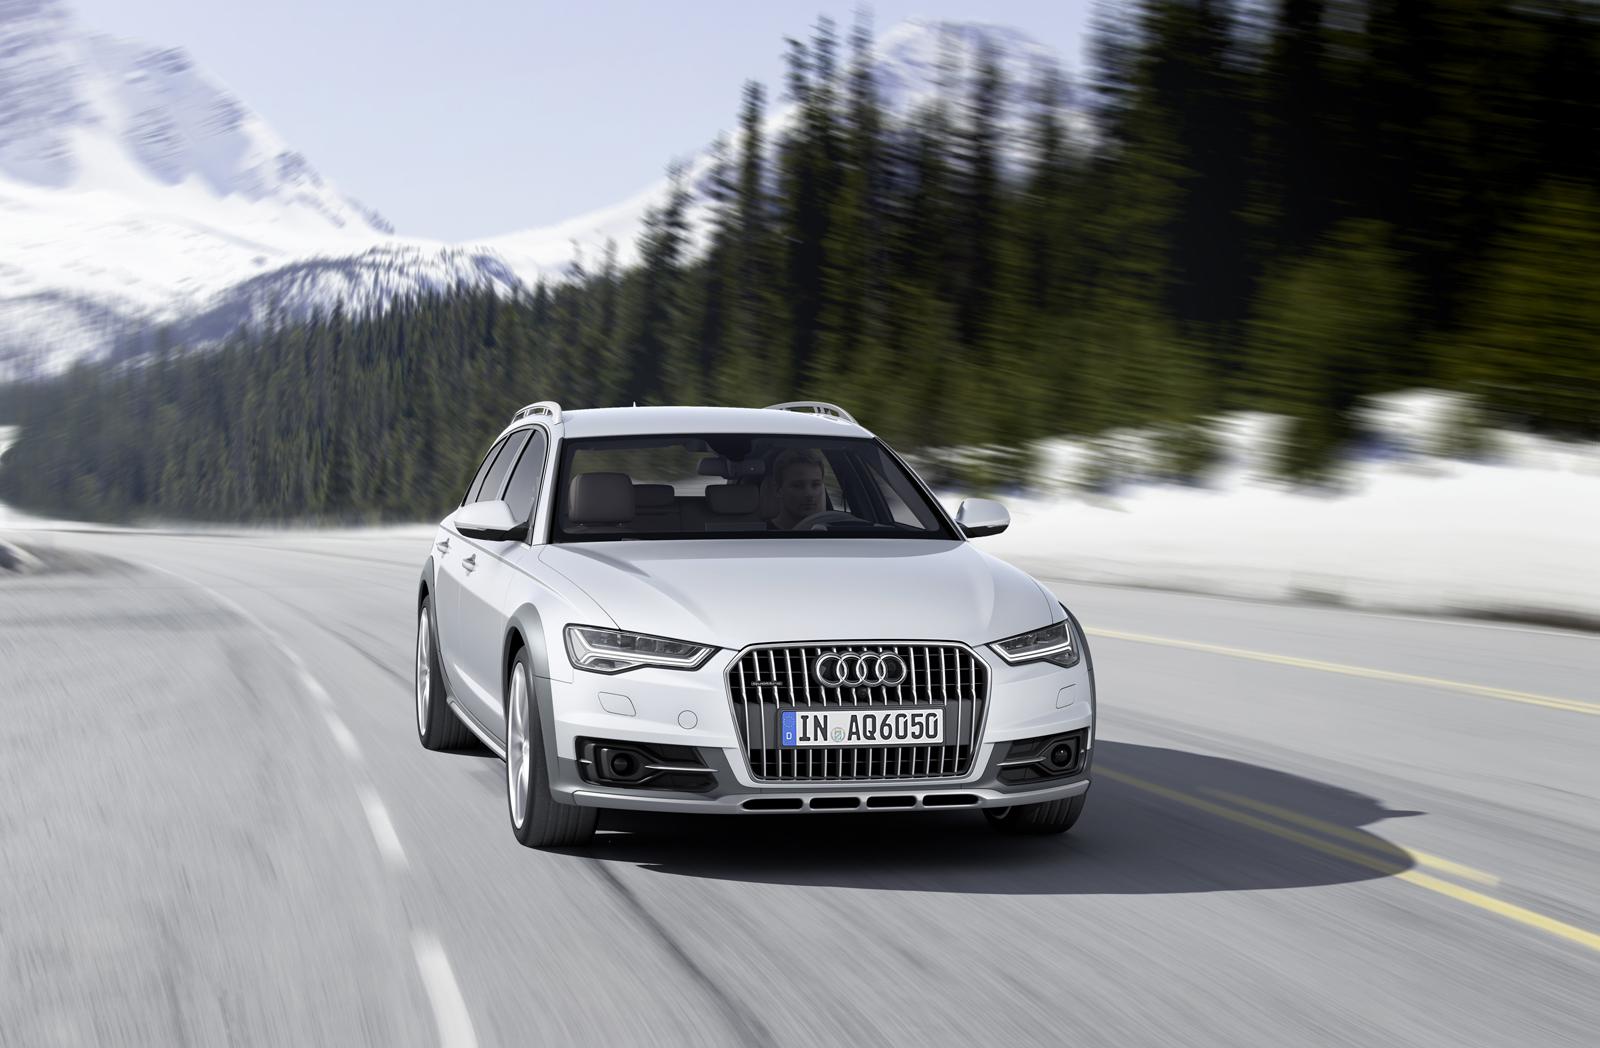 2016 Audi A6 allroad для США